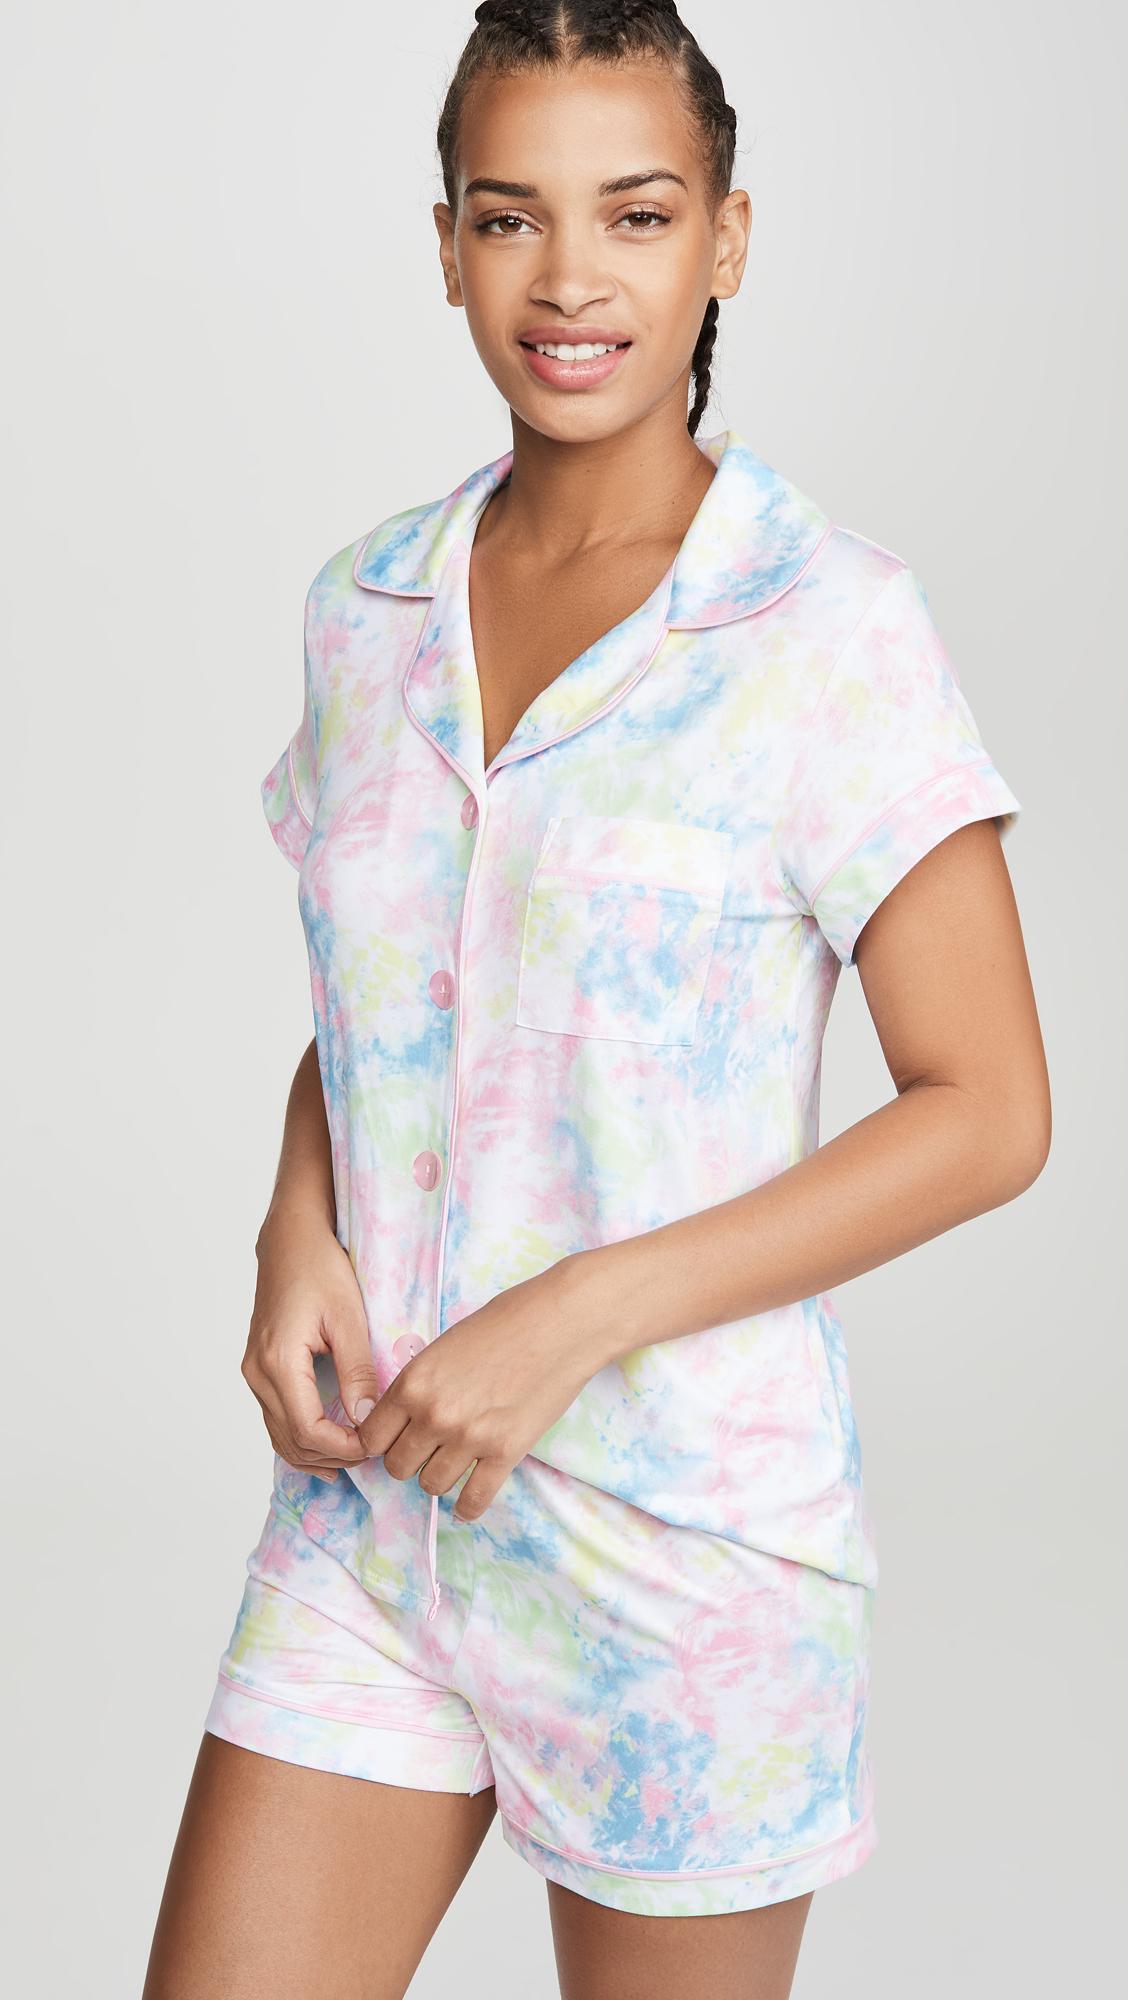 Nina Dobrev's Tie-Dye Matching Set Is Absolutely My Next Purchase 13